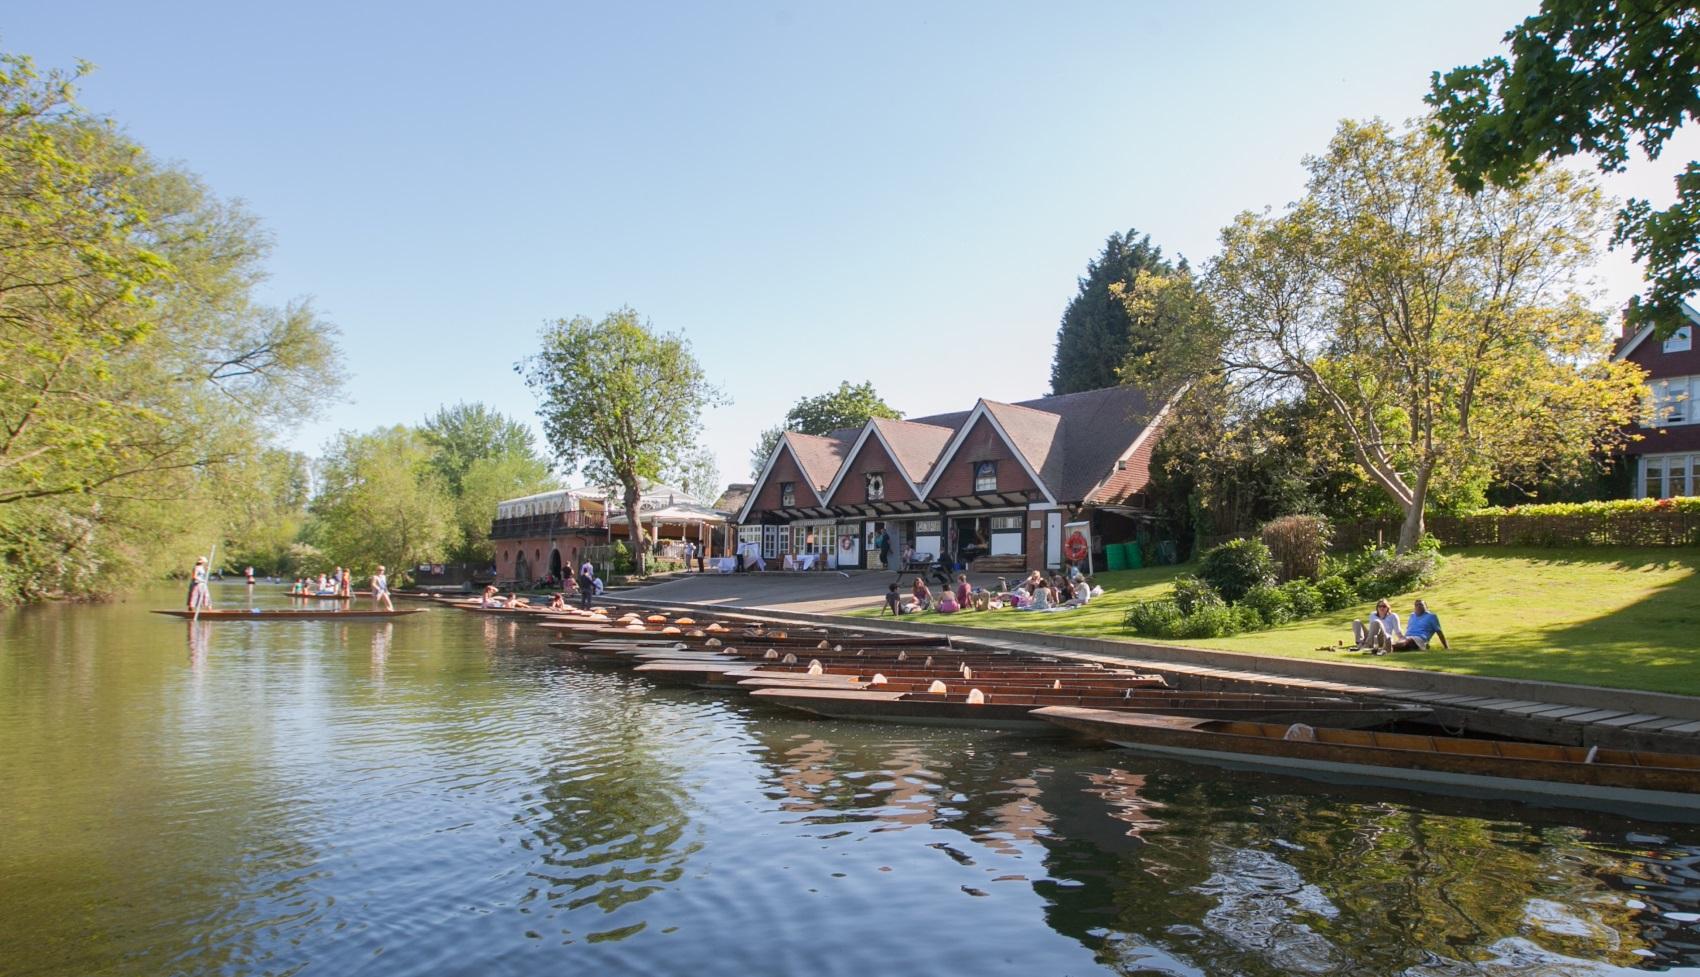 The Cherwell Boathouse